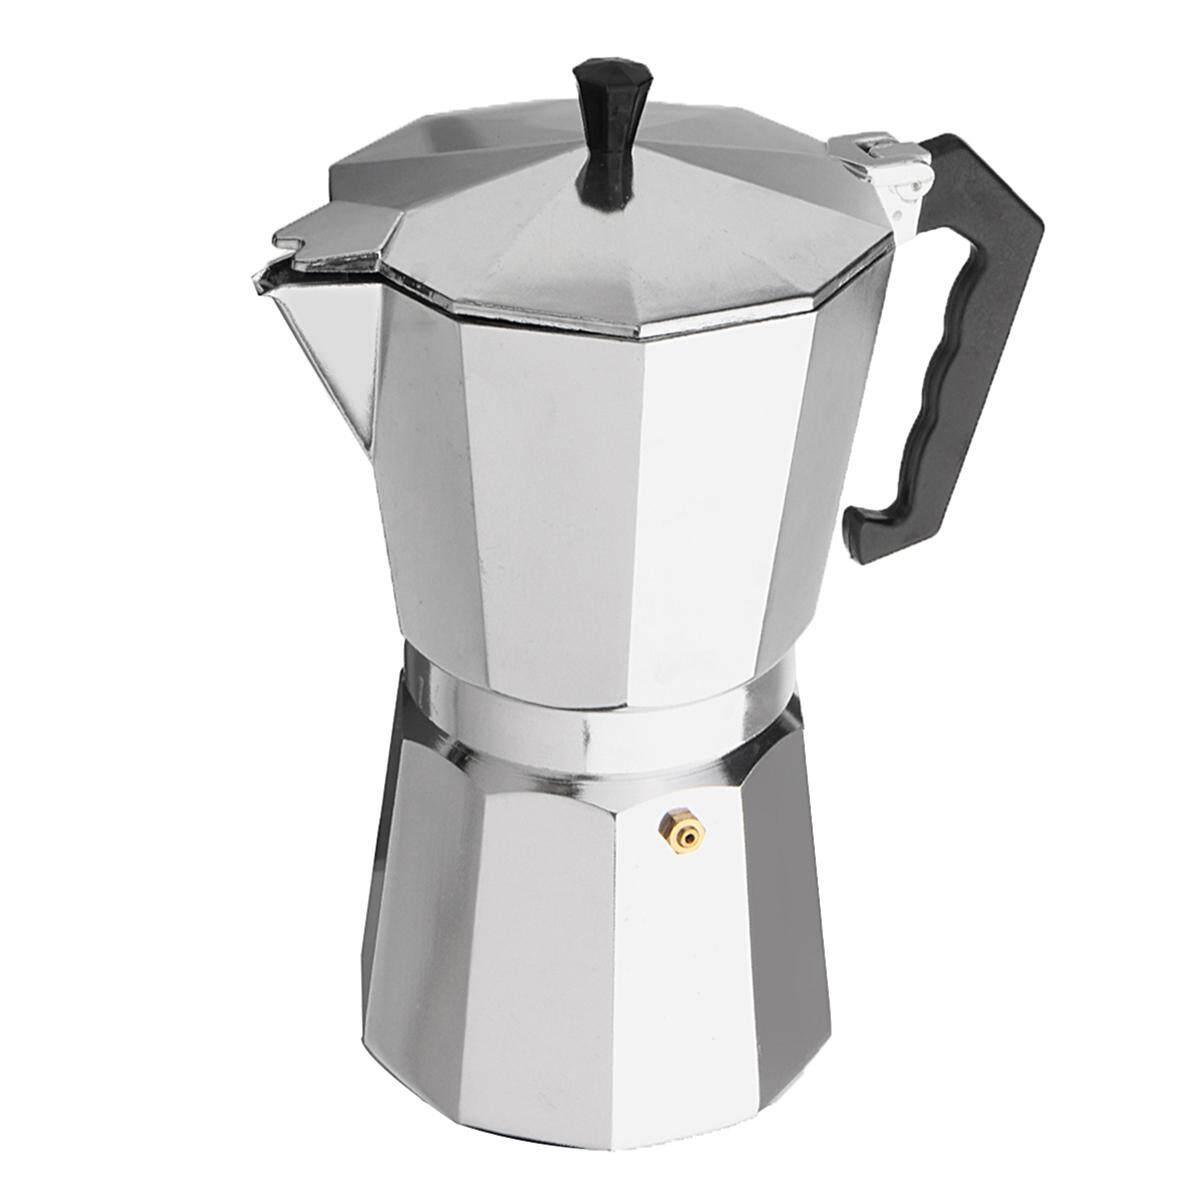 600ML 12 Cup Coffee Moka Pot Stove Percolator Maker Top Expresso Latte Aluminum - Silver ...